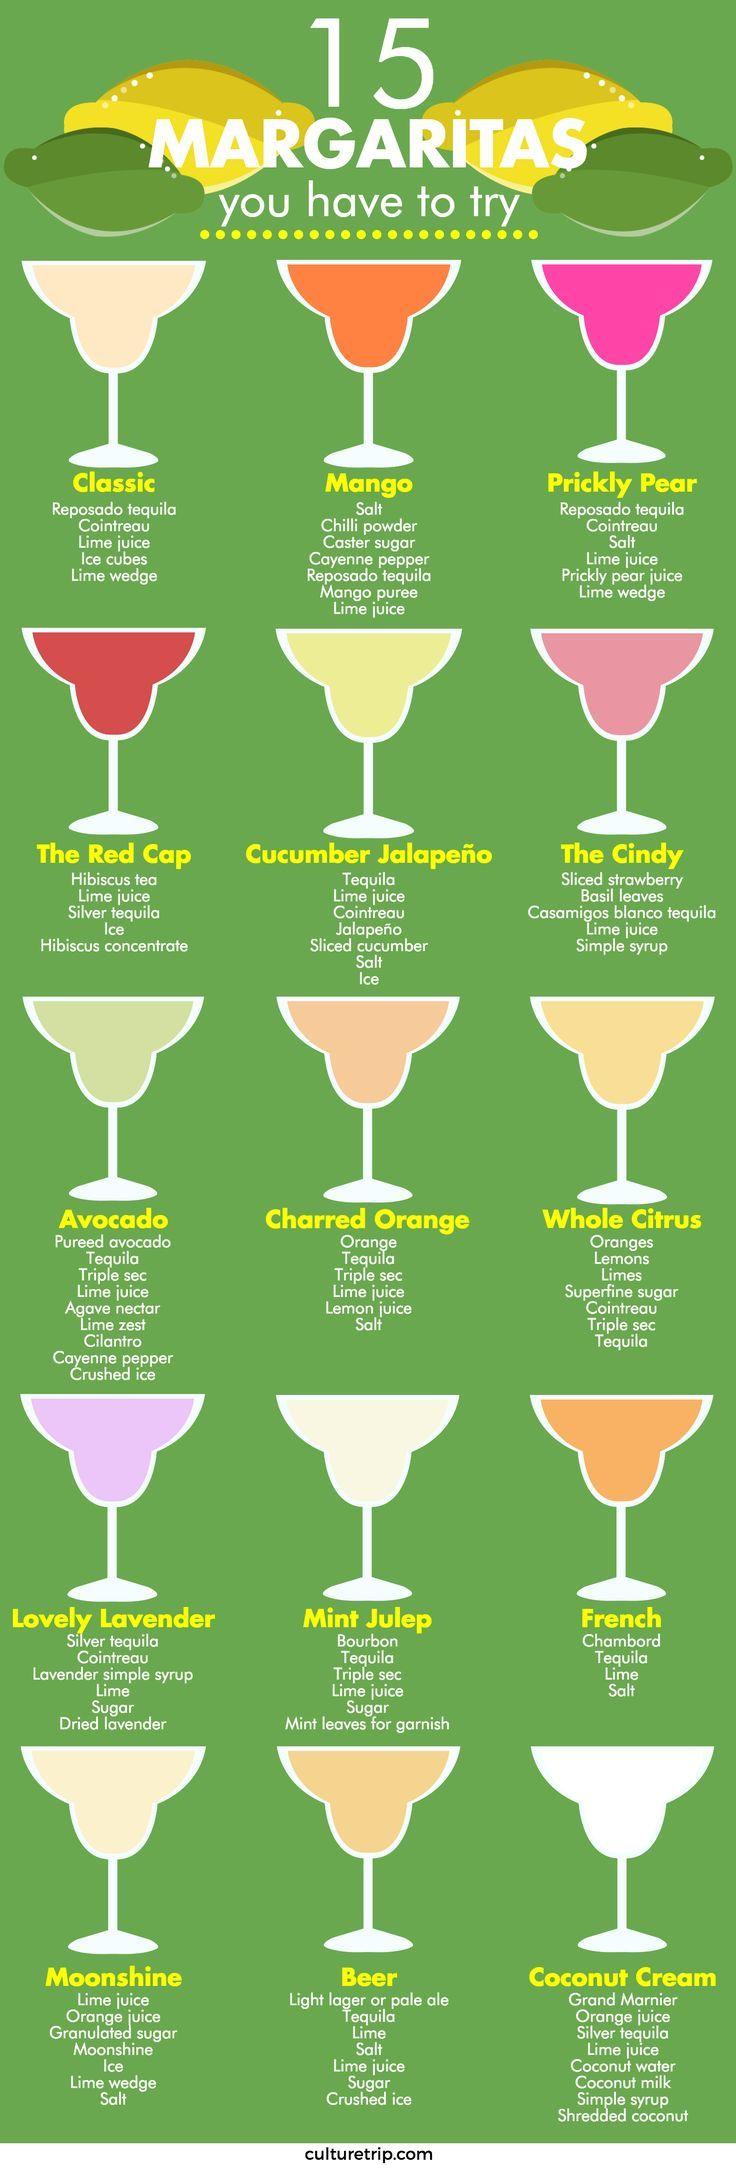 15 Margarita Recipes for National Margarita Day